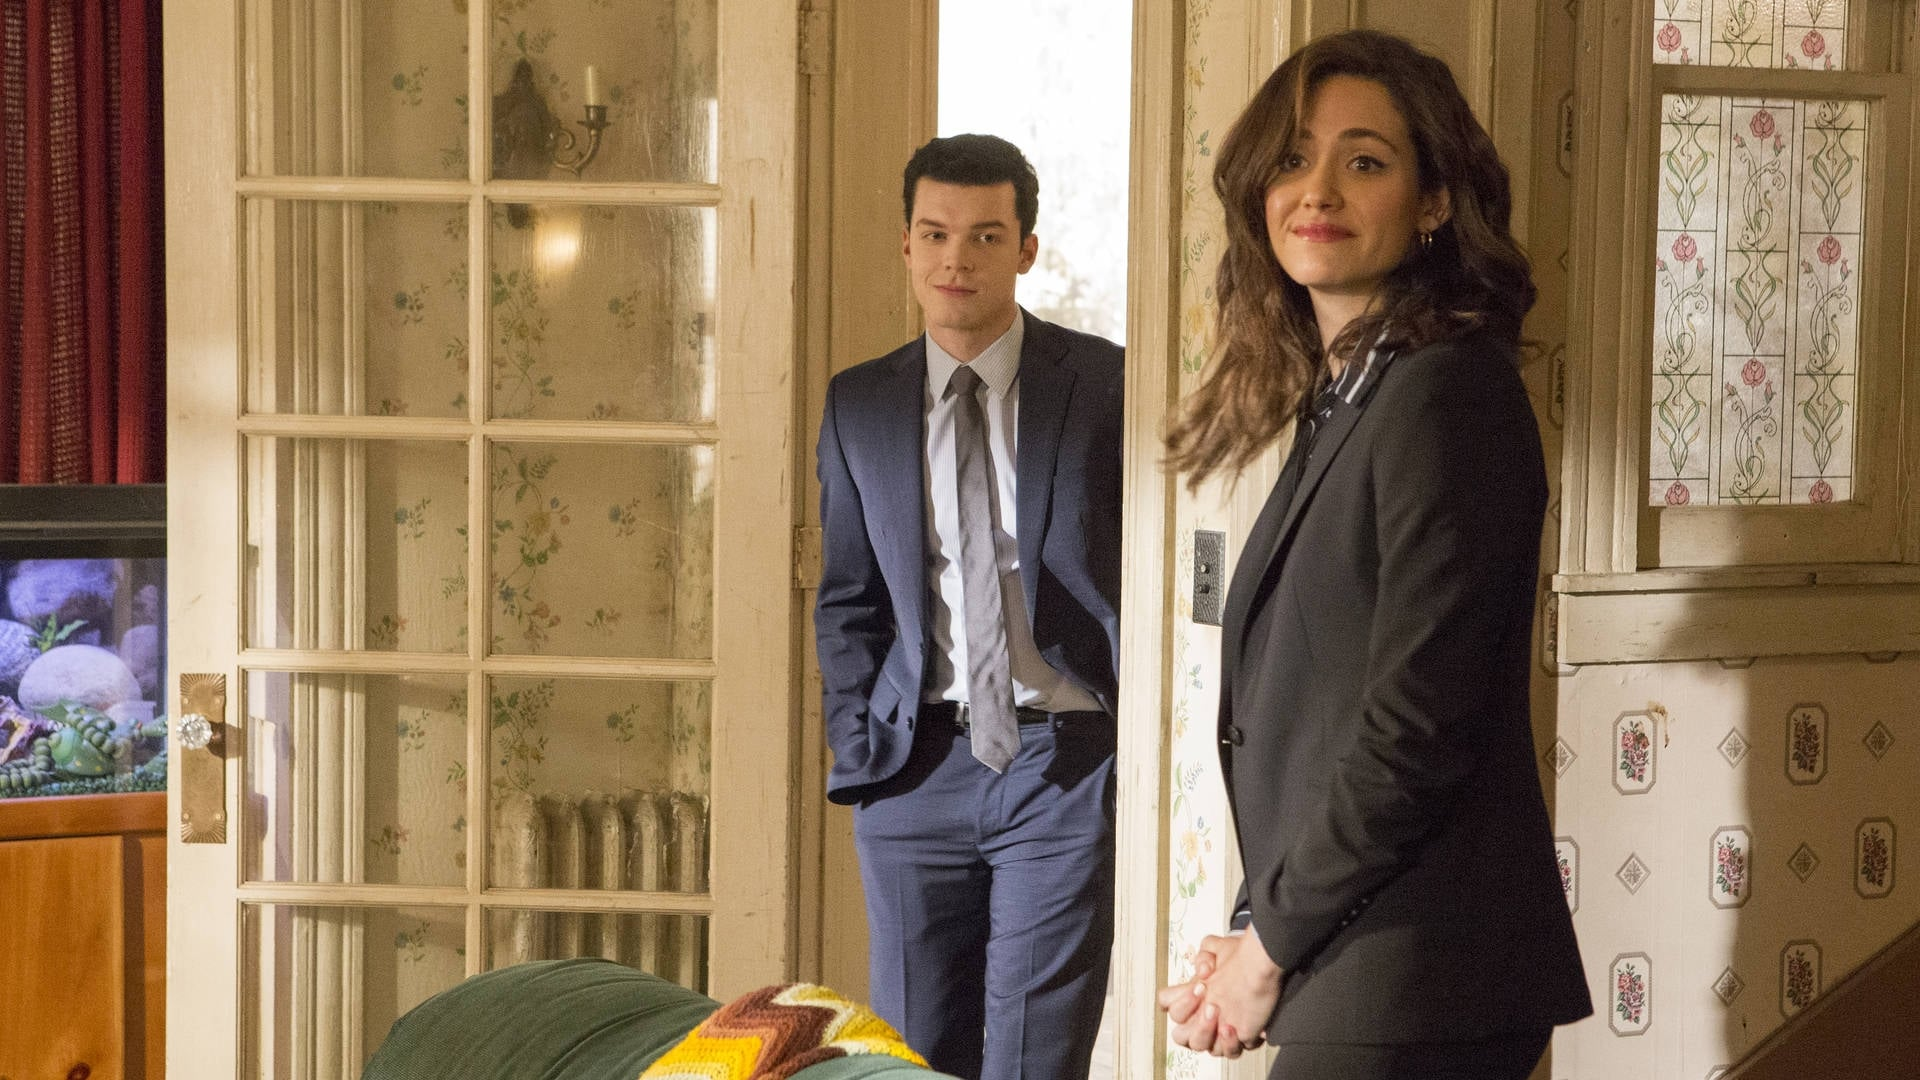 shameless season 5 episode 5 watch online